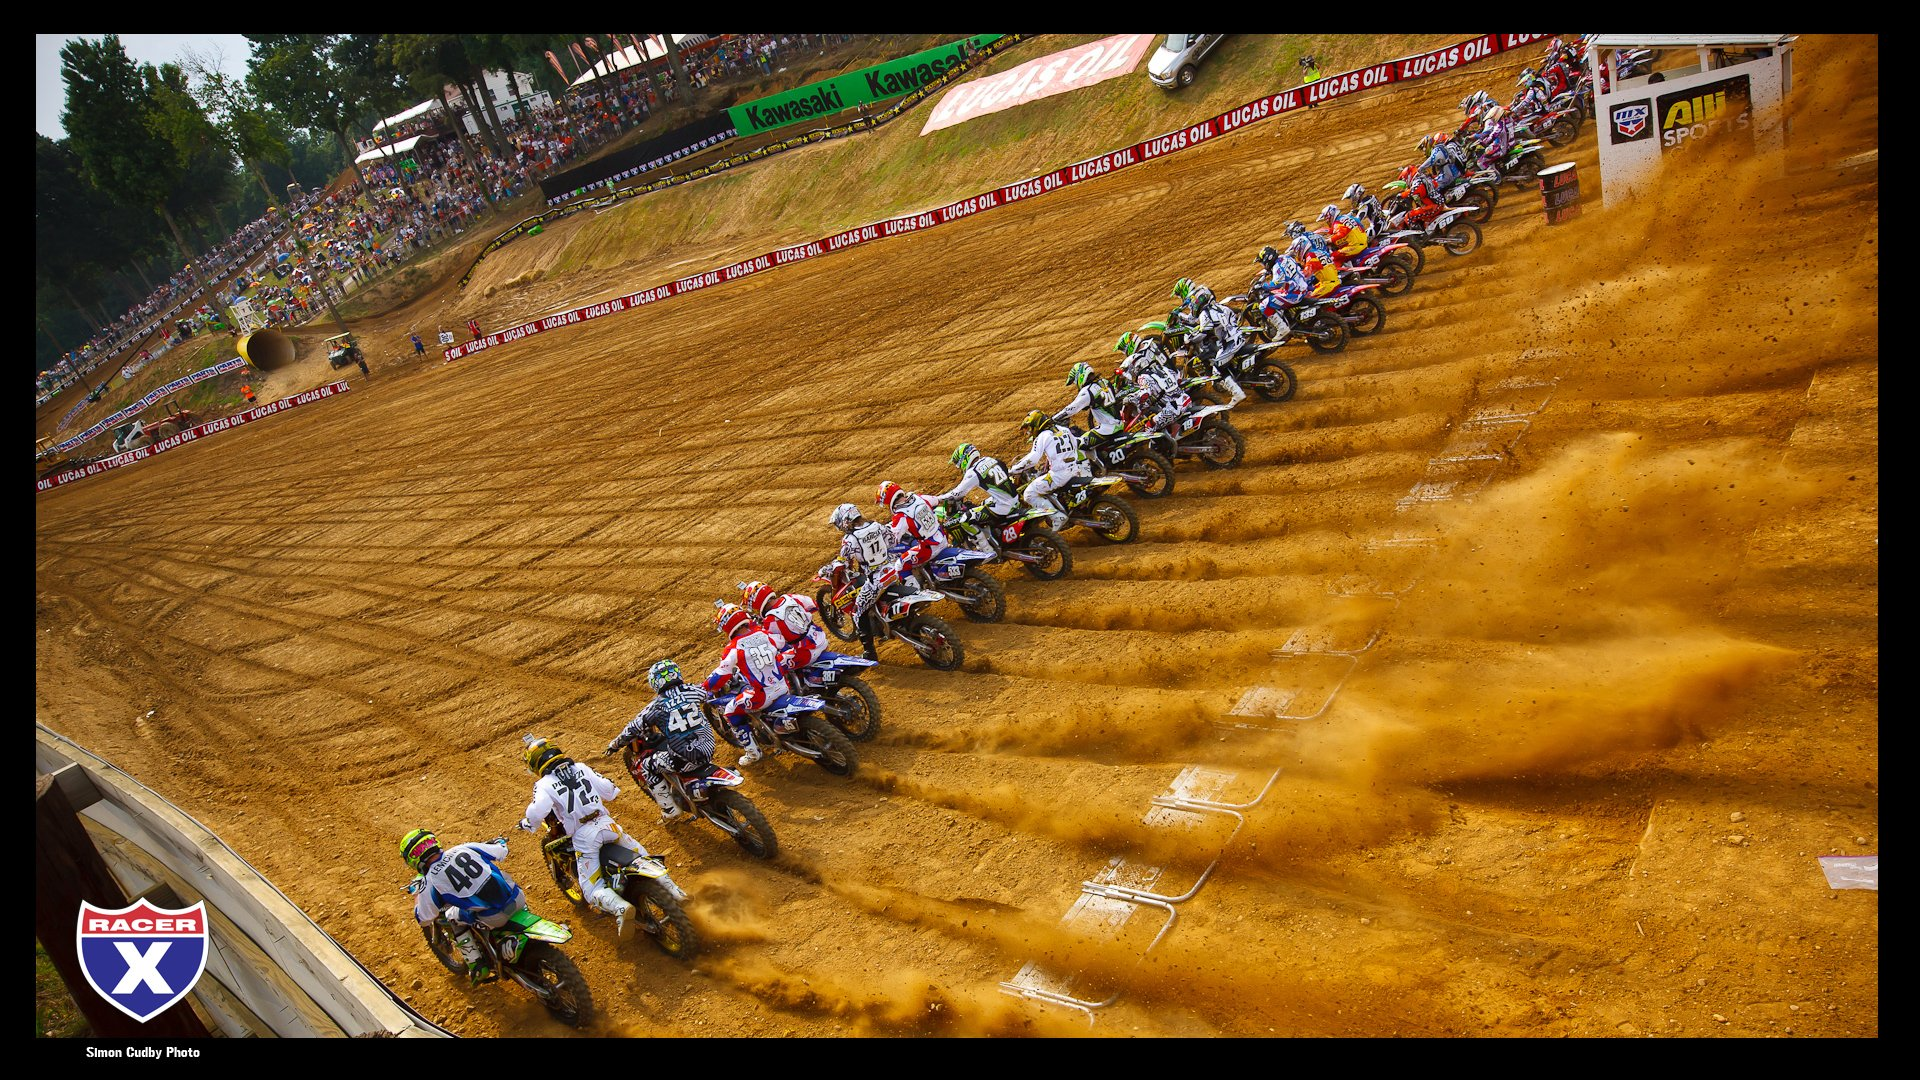 Budds Creek Wallpapers Motocross Racer X Online